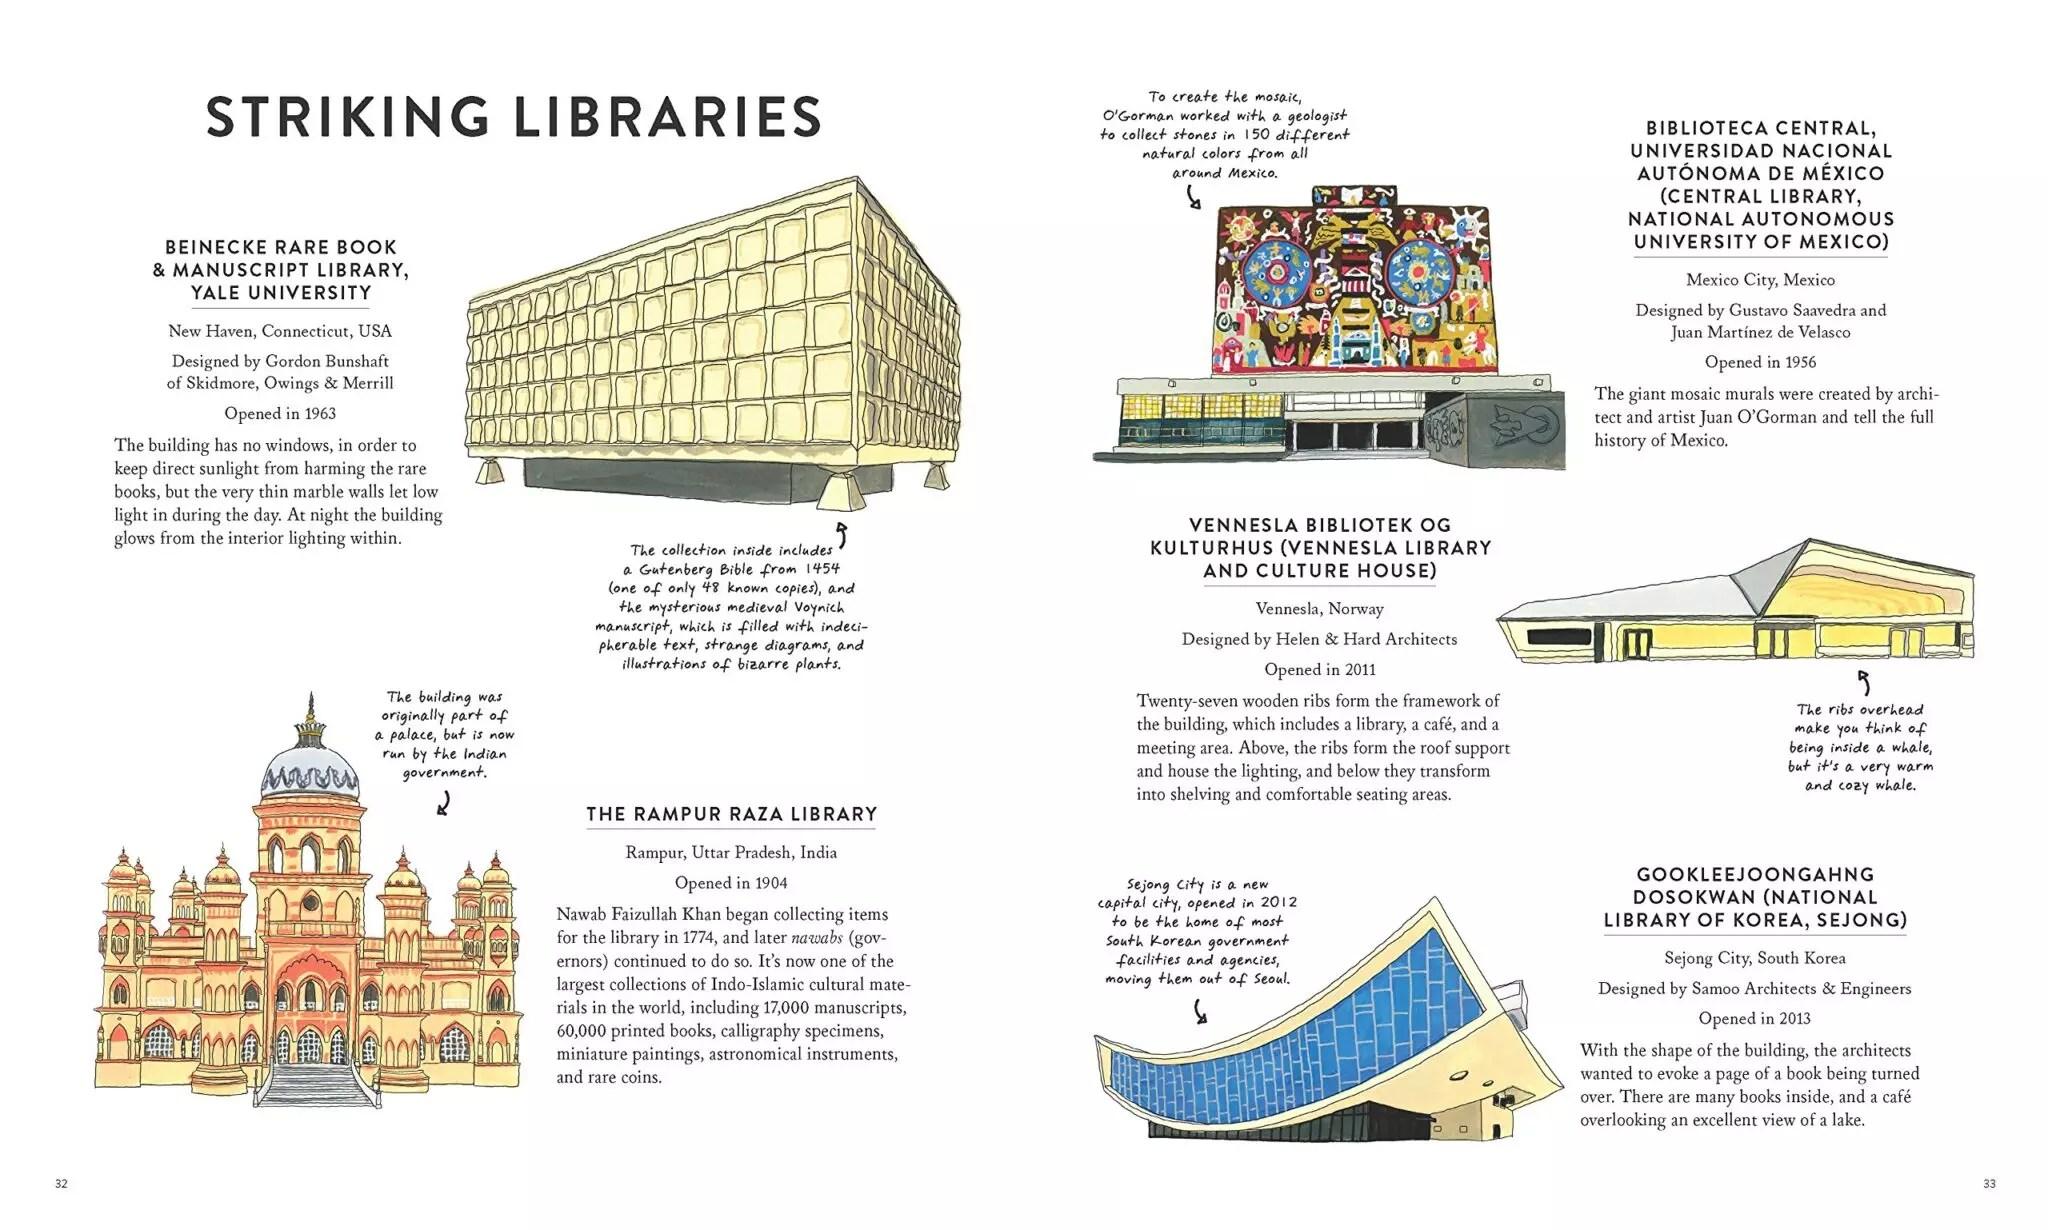 bibliophile illustration 4